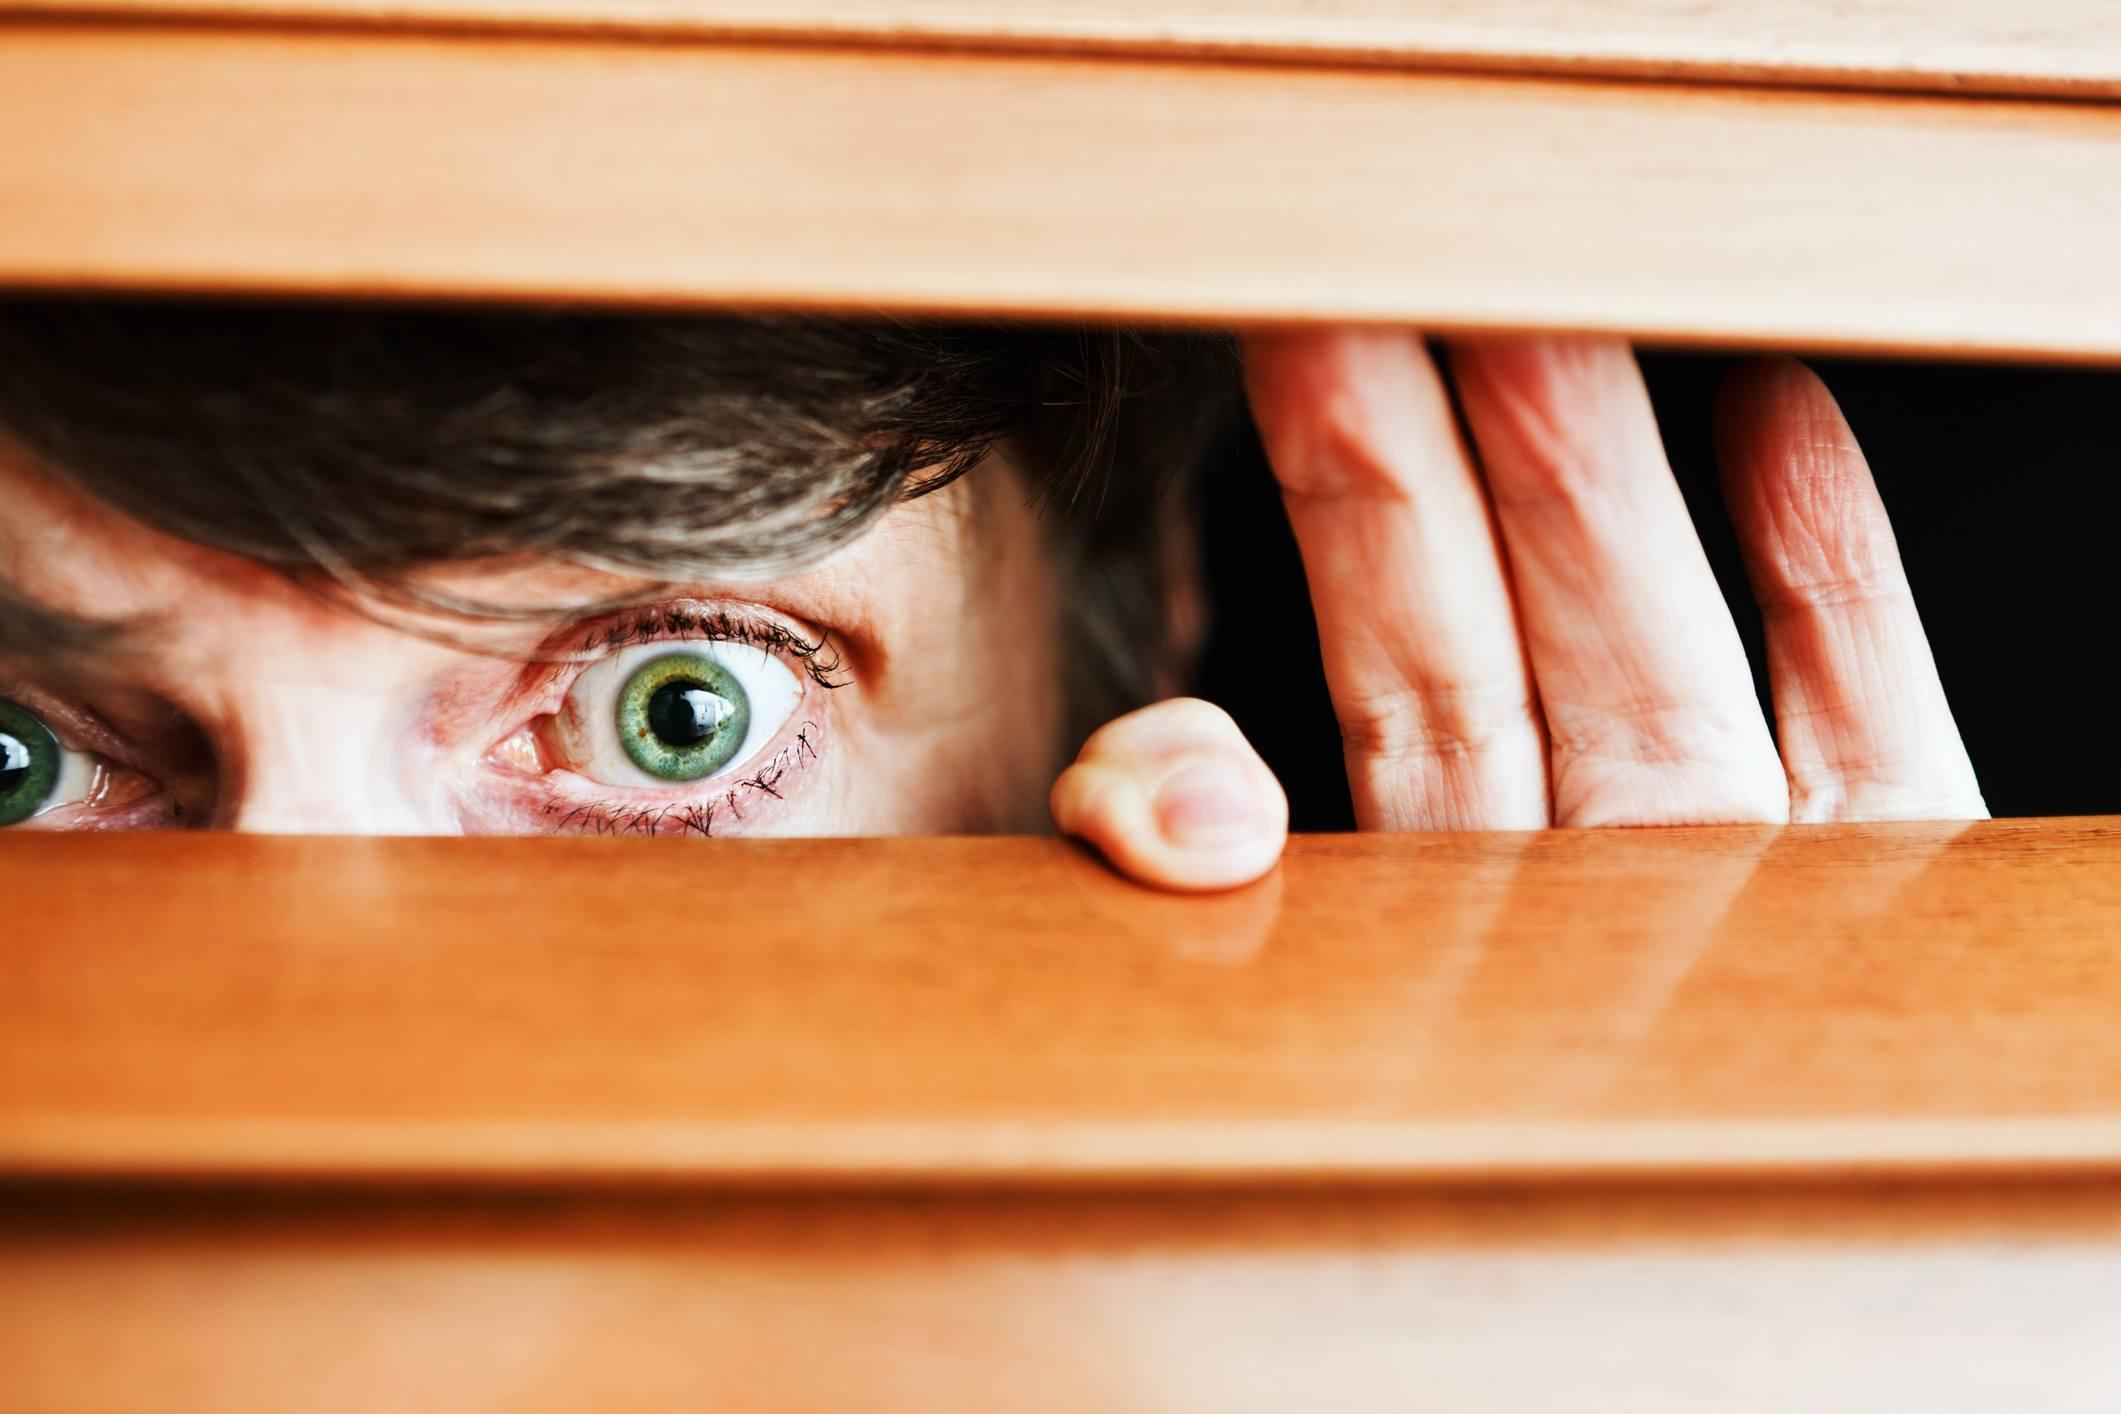 Nosy neighbor peeking through blinds